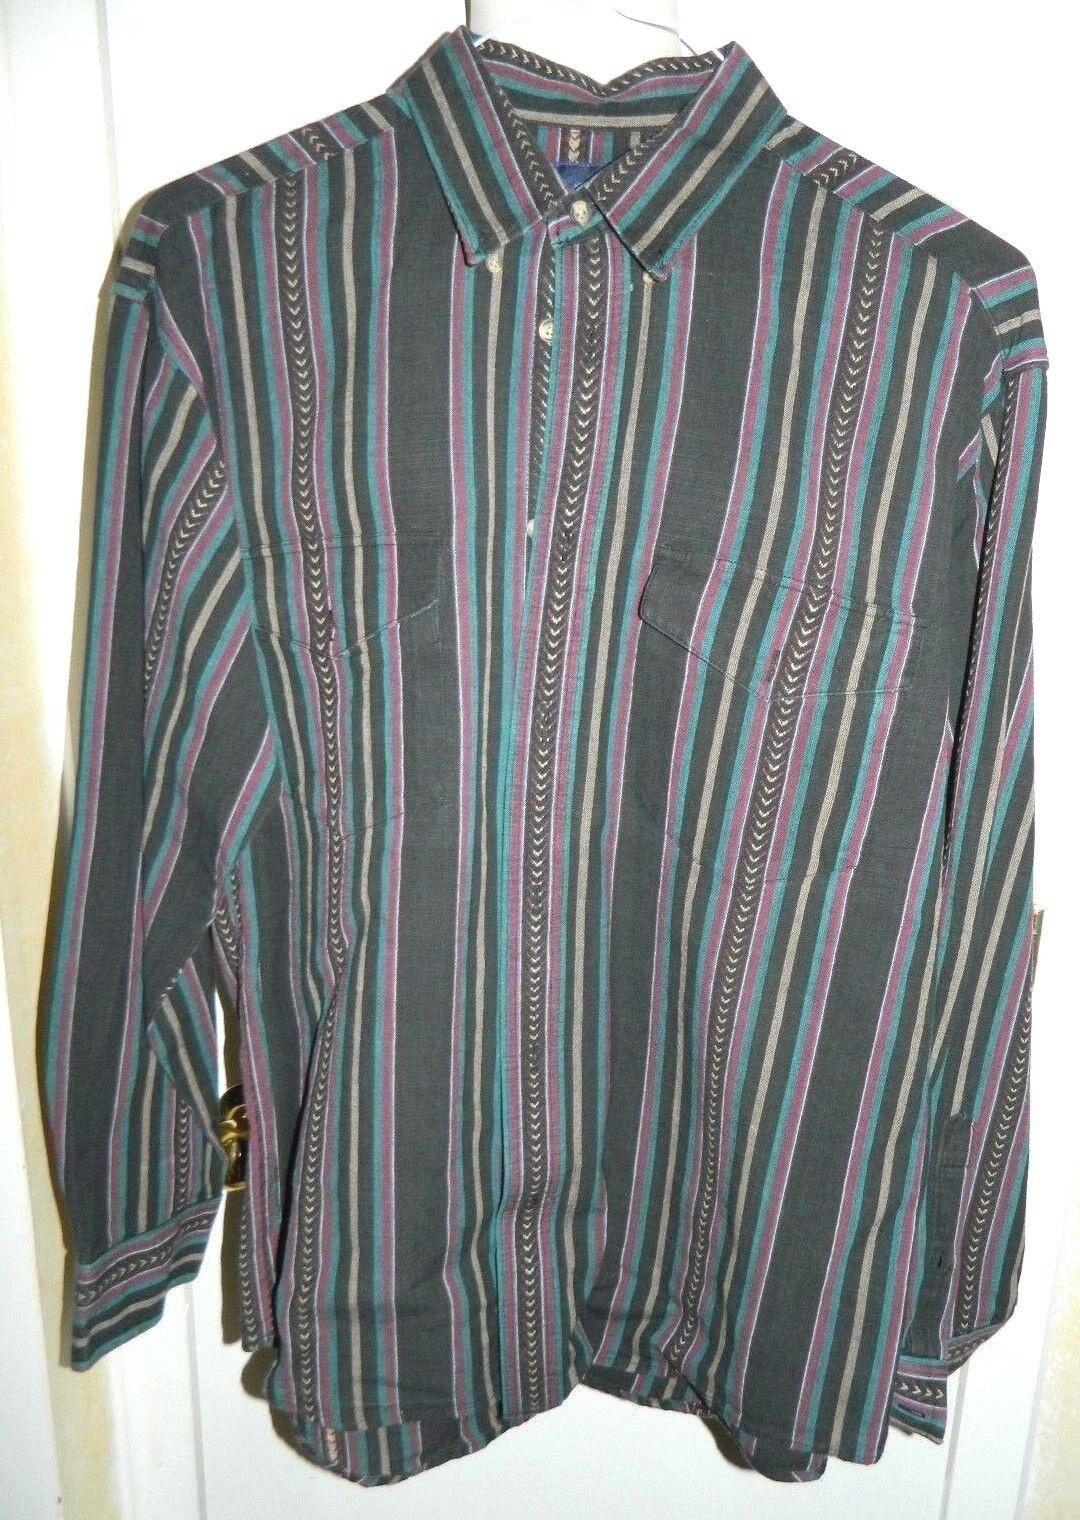 WRANGLER X-Long Tails Cowboy Southwestern Style Button Men's Shirt 16 1 2 - 36